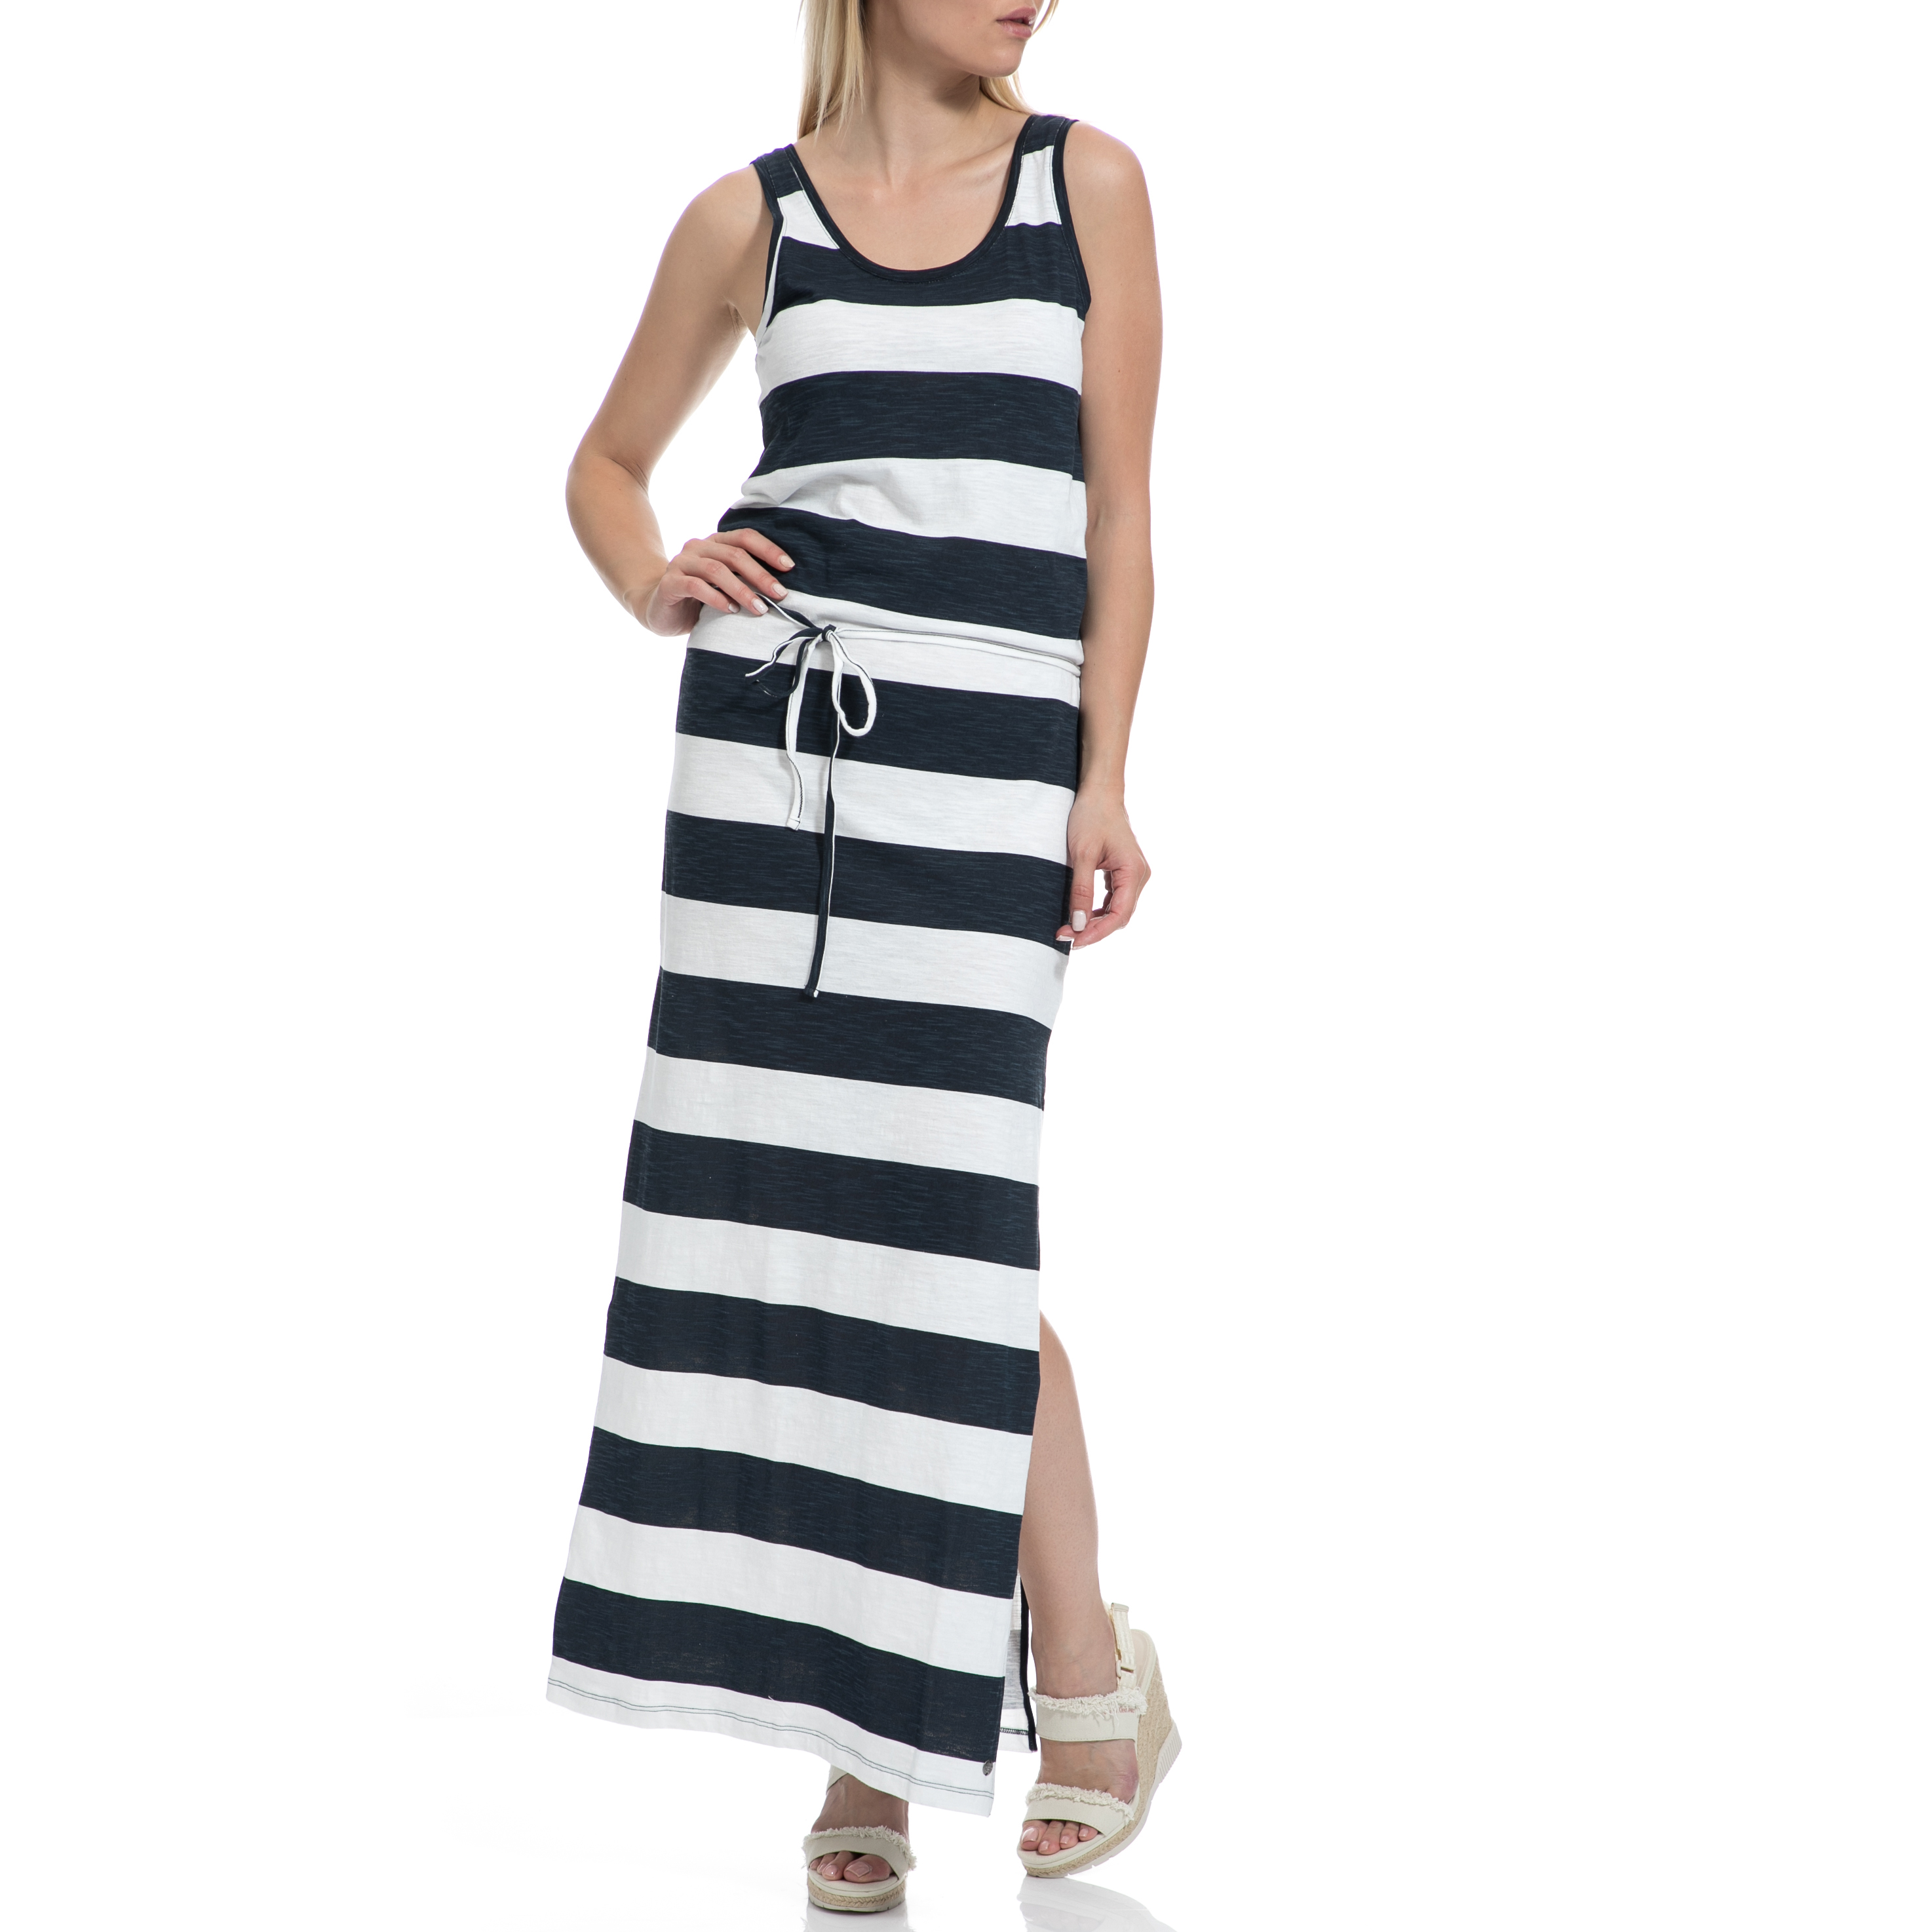 GARCIA JEANS - Γυναικείο φόρεμα GARCIA JEANS ασπρόμαυρο